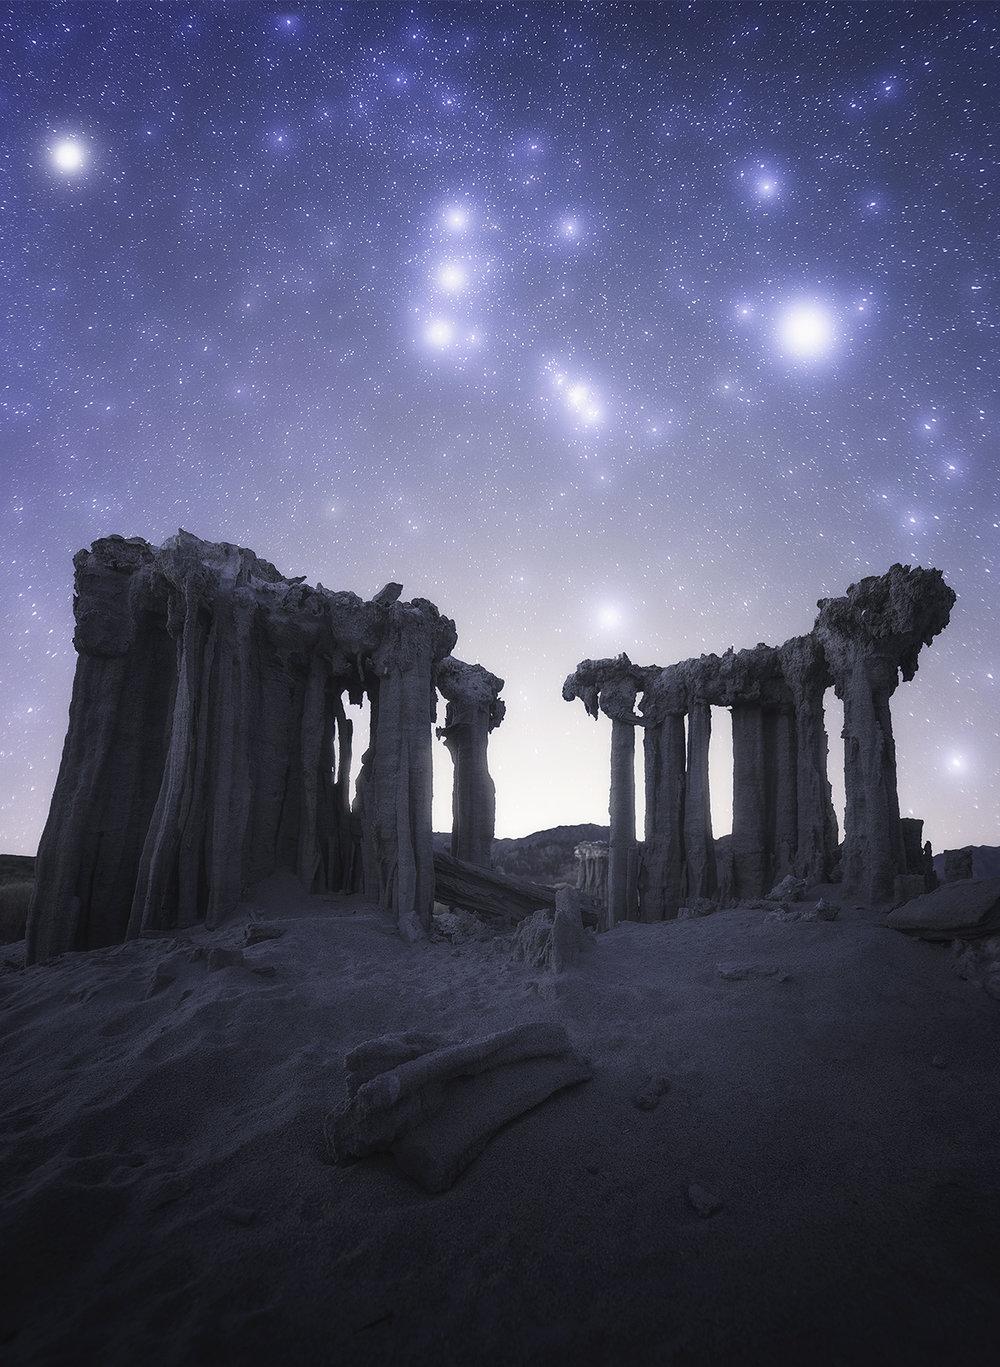 The Orion Constellation rises above delicate tufa columns